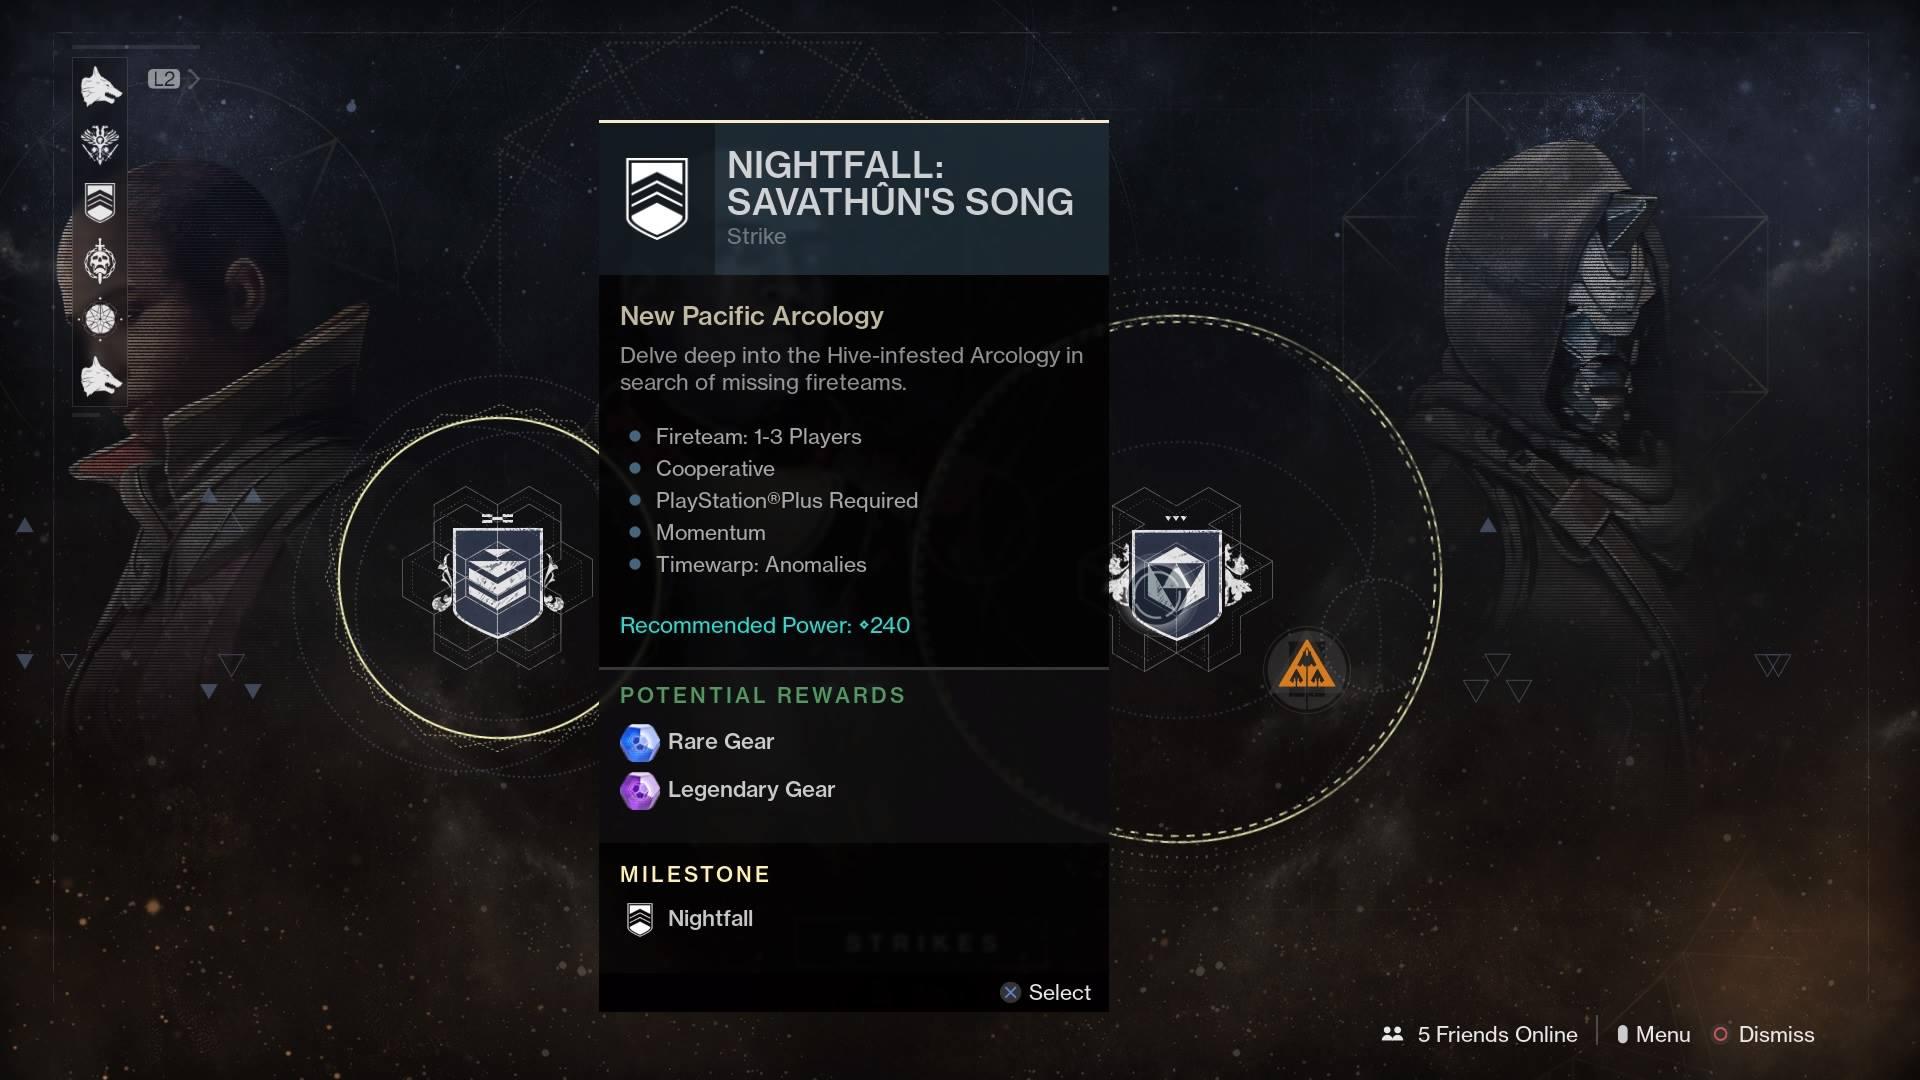 destiny nightfall matchmaking 2017